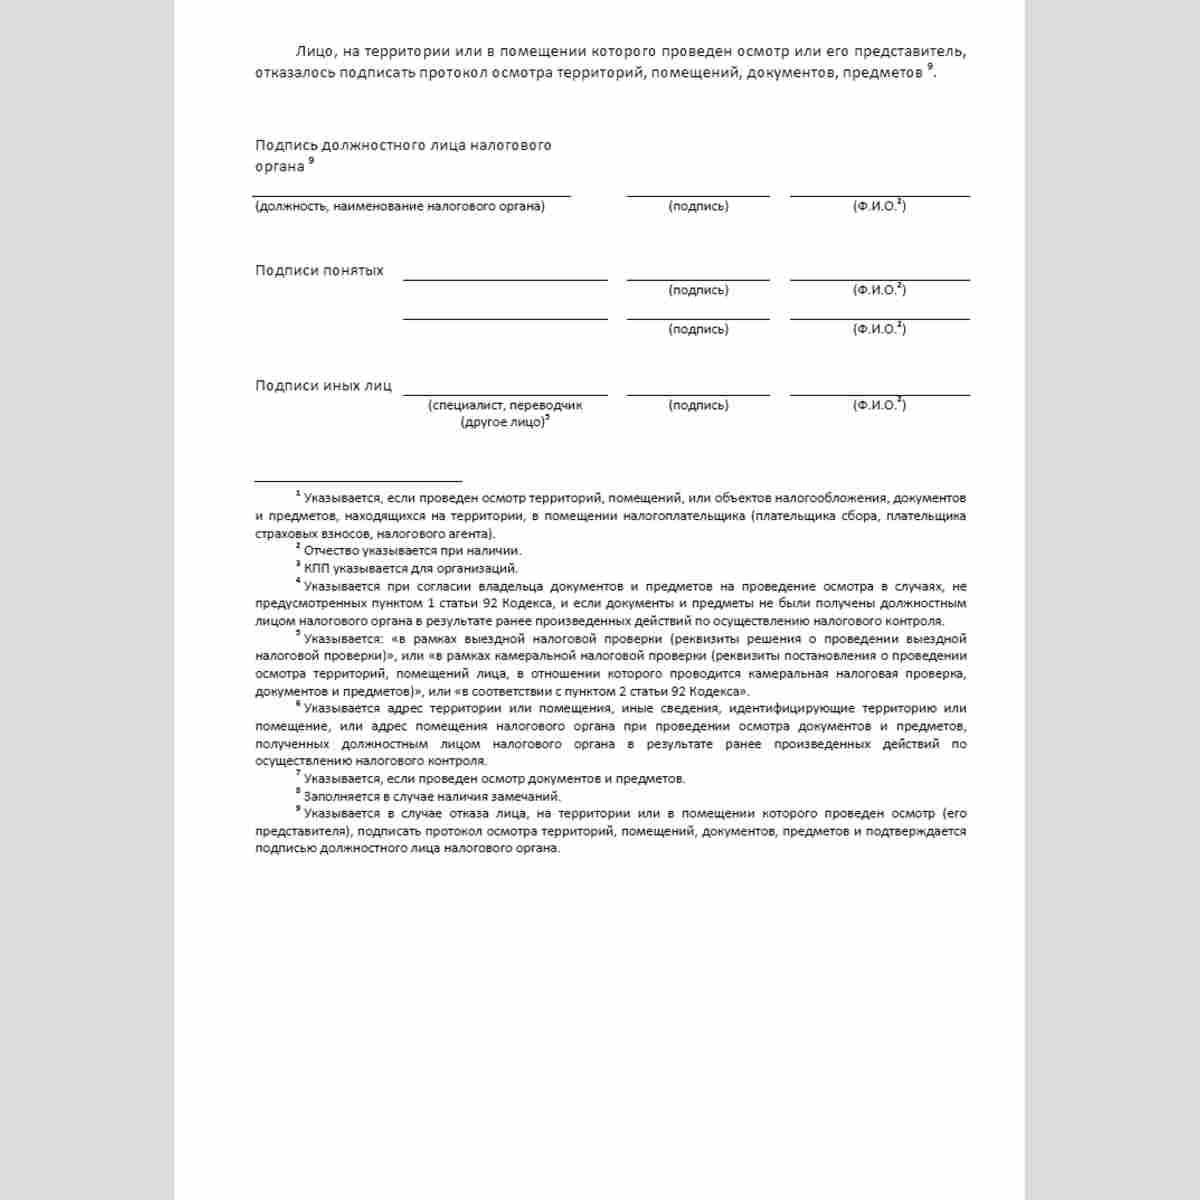 "Форма КНД 1165012 ""Протокол осмотра территорий, помещений, документов, предметов"". Стр. 3"